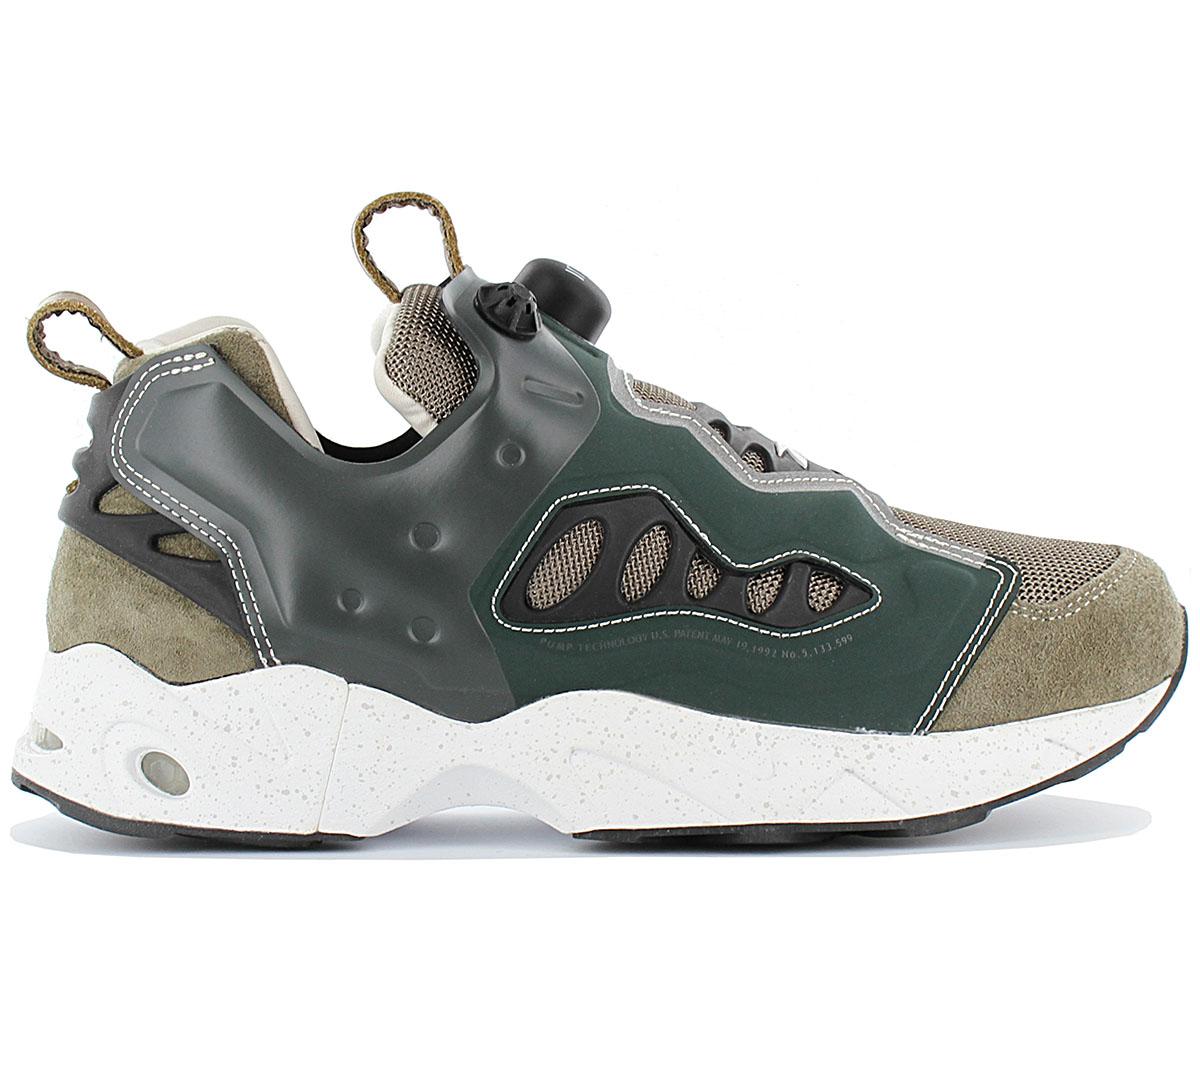 5217b1f9e9fdb Reebok x Garbstore Instapump Fury Road (Cliffstone) Shoes Trainers ...